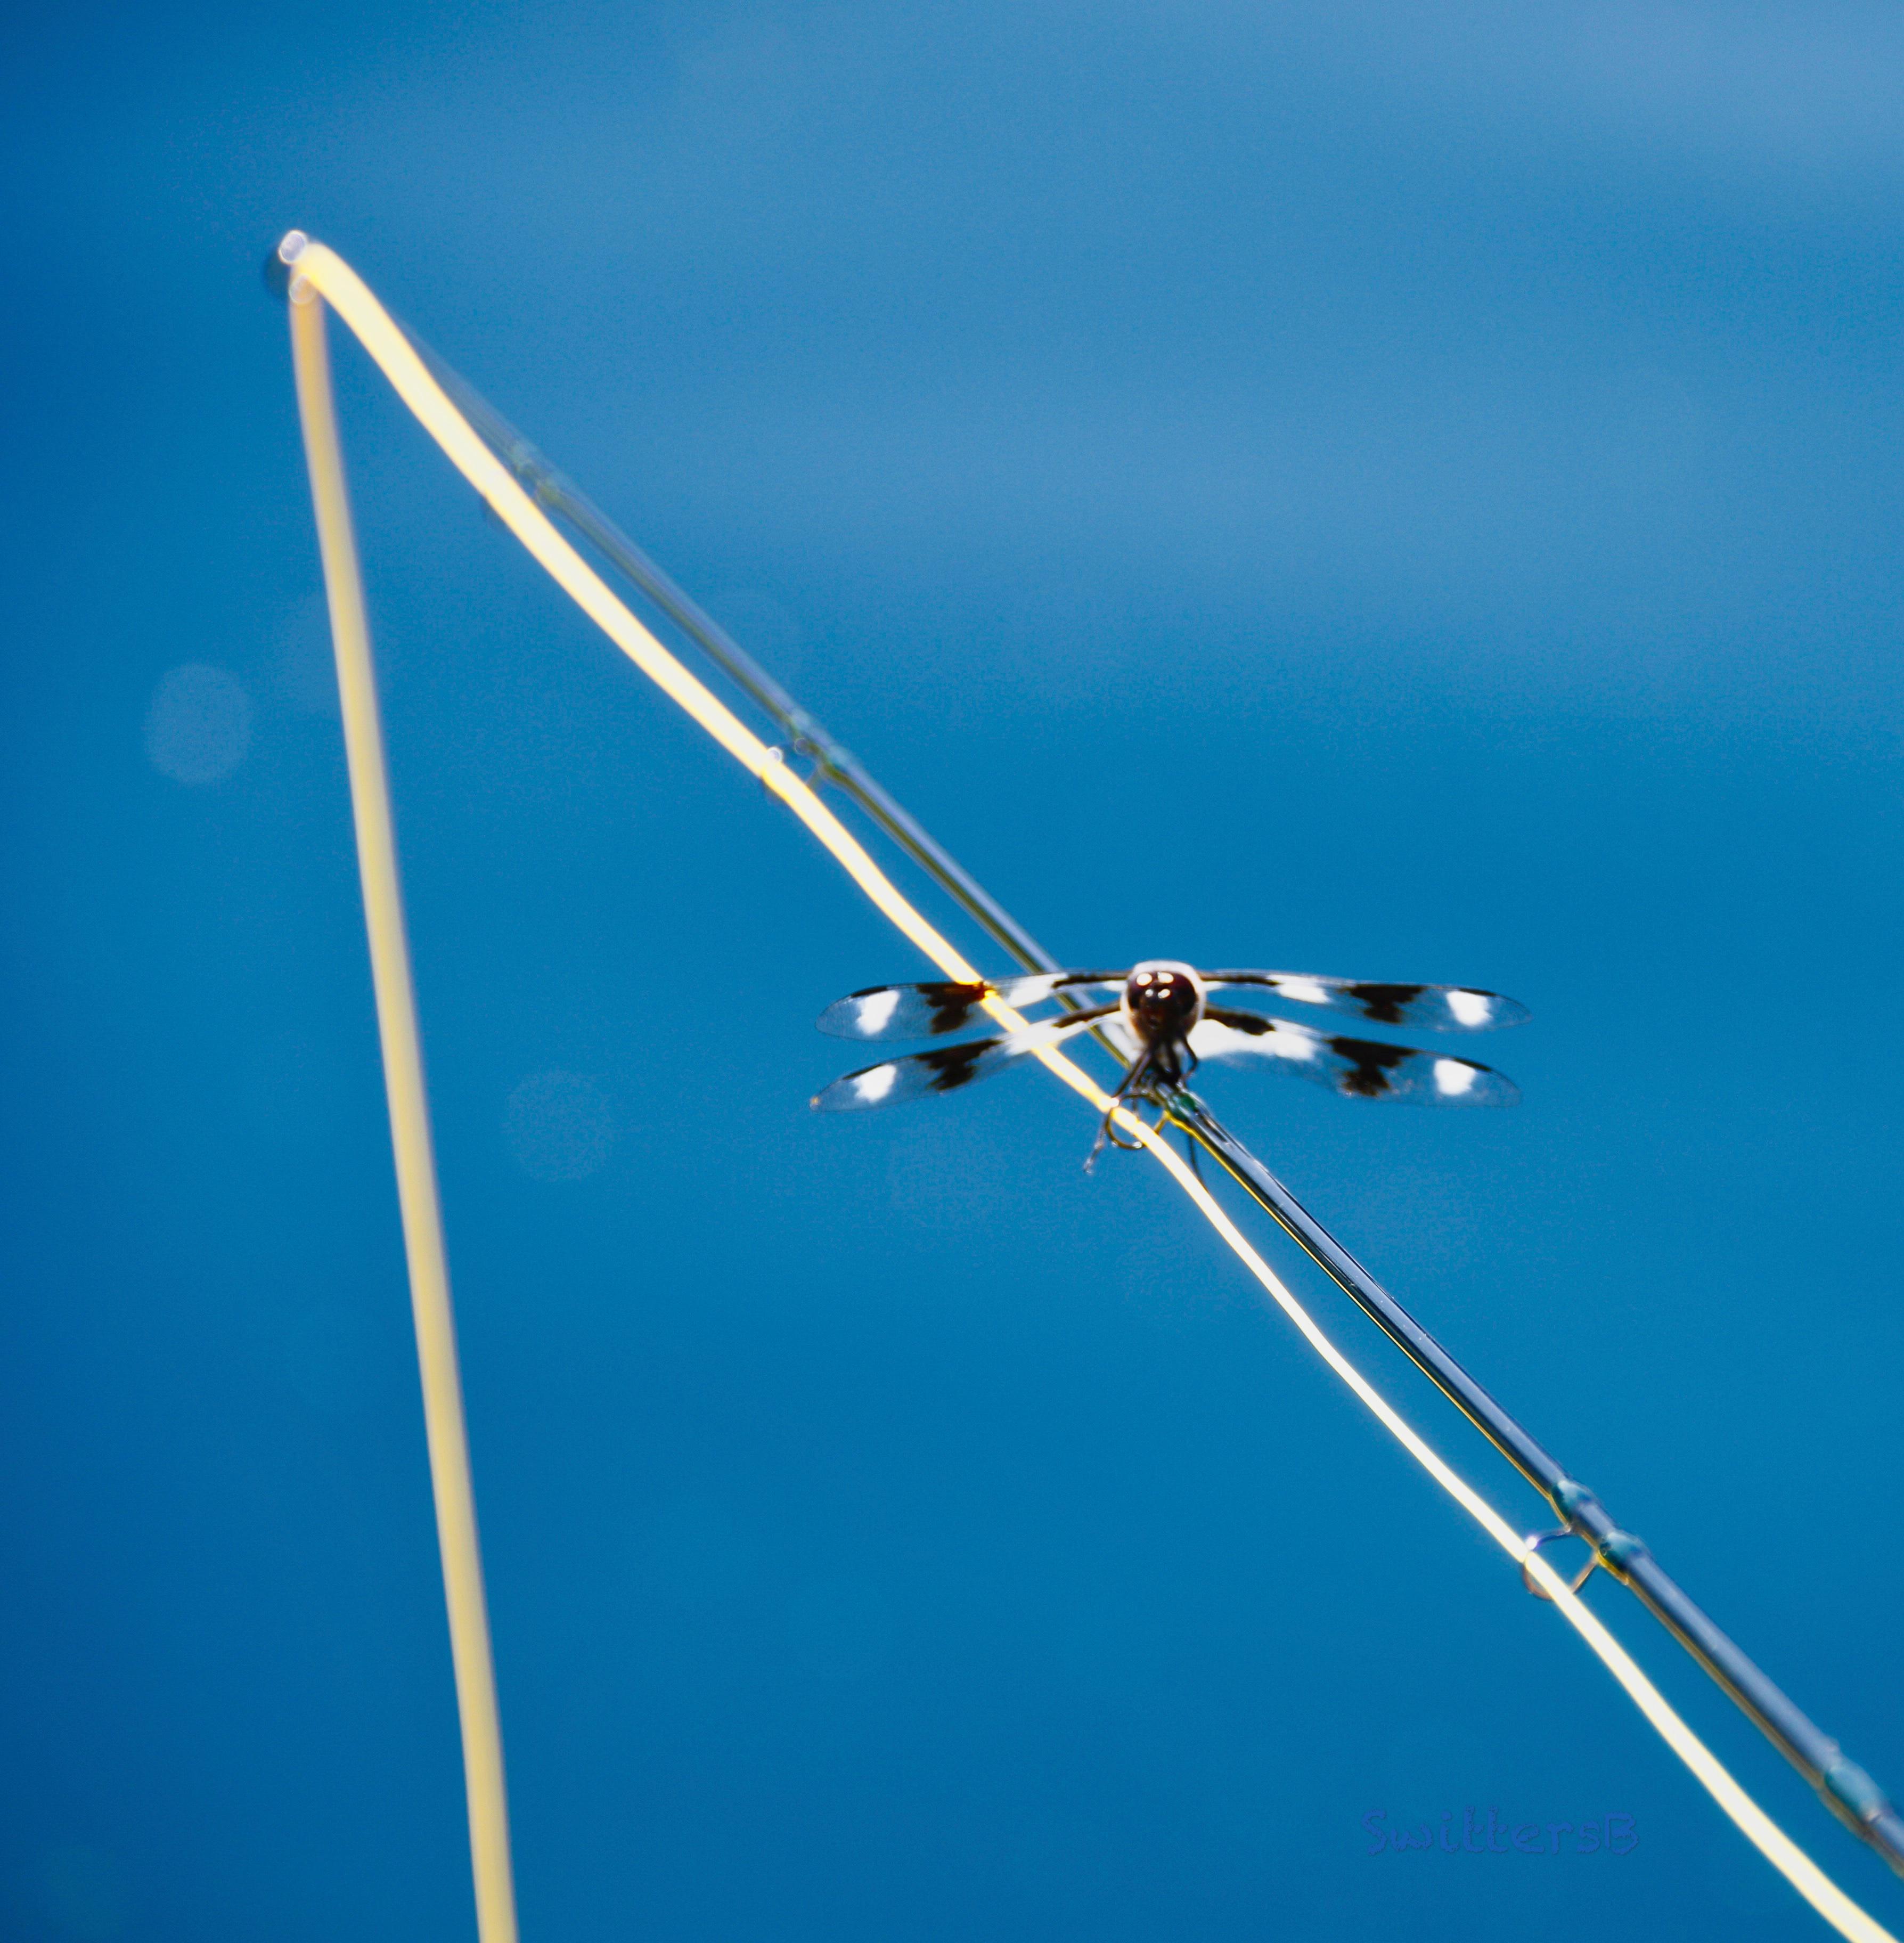 Fly Fishing-Dragon fly-SwittersB